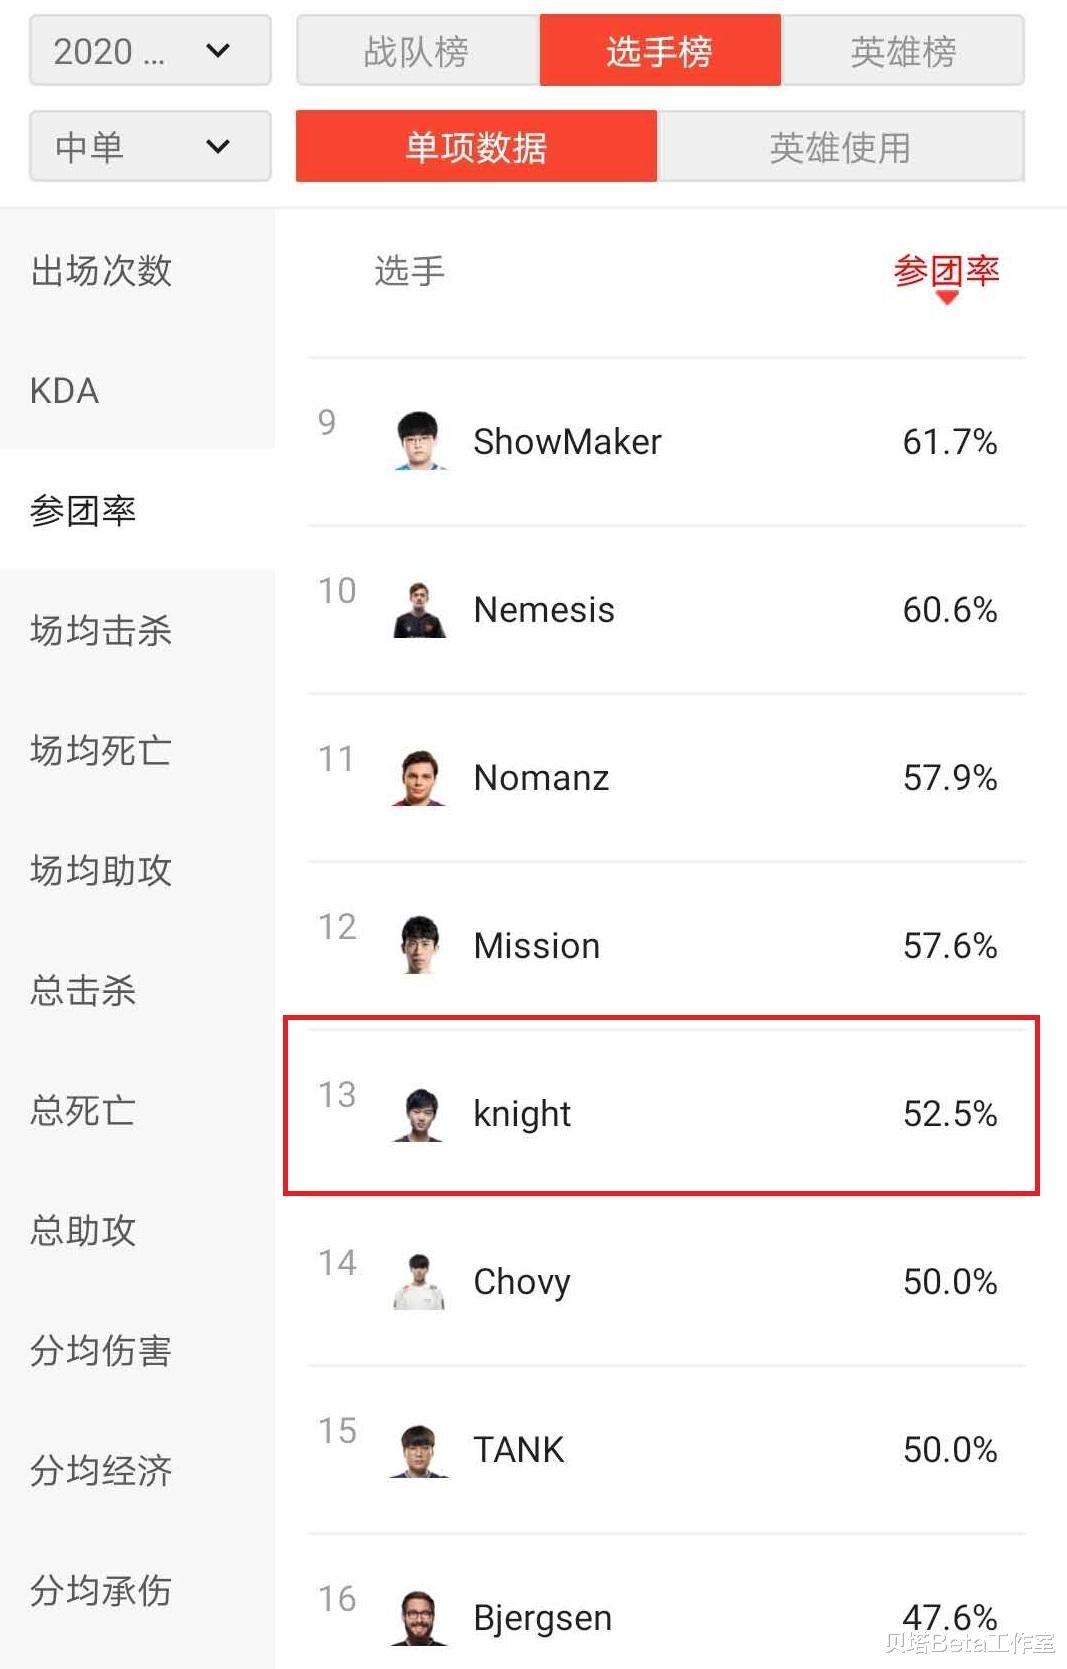 S10小組賽第1輪後,Knight被質疑表現不佳!7項數據排名倒數-圖2